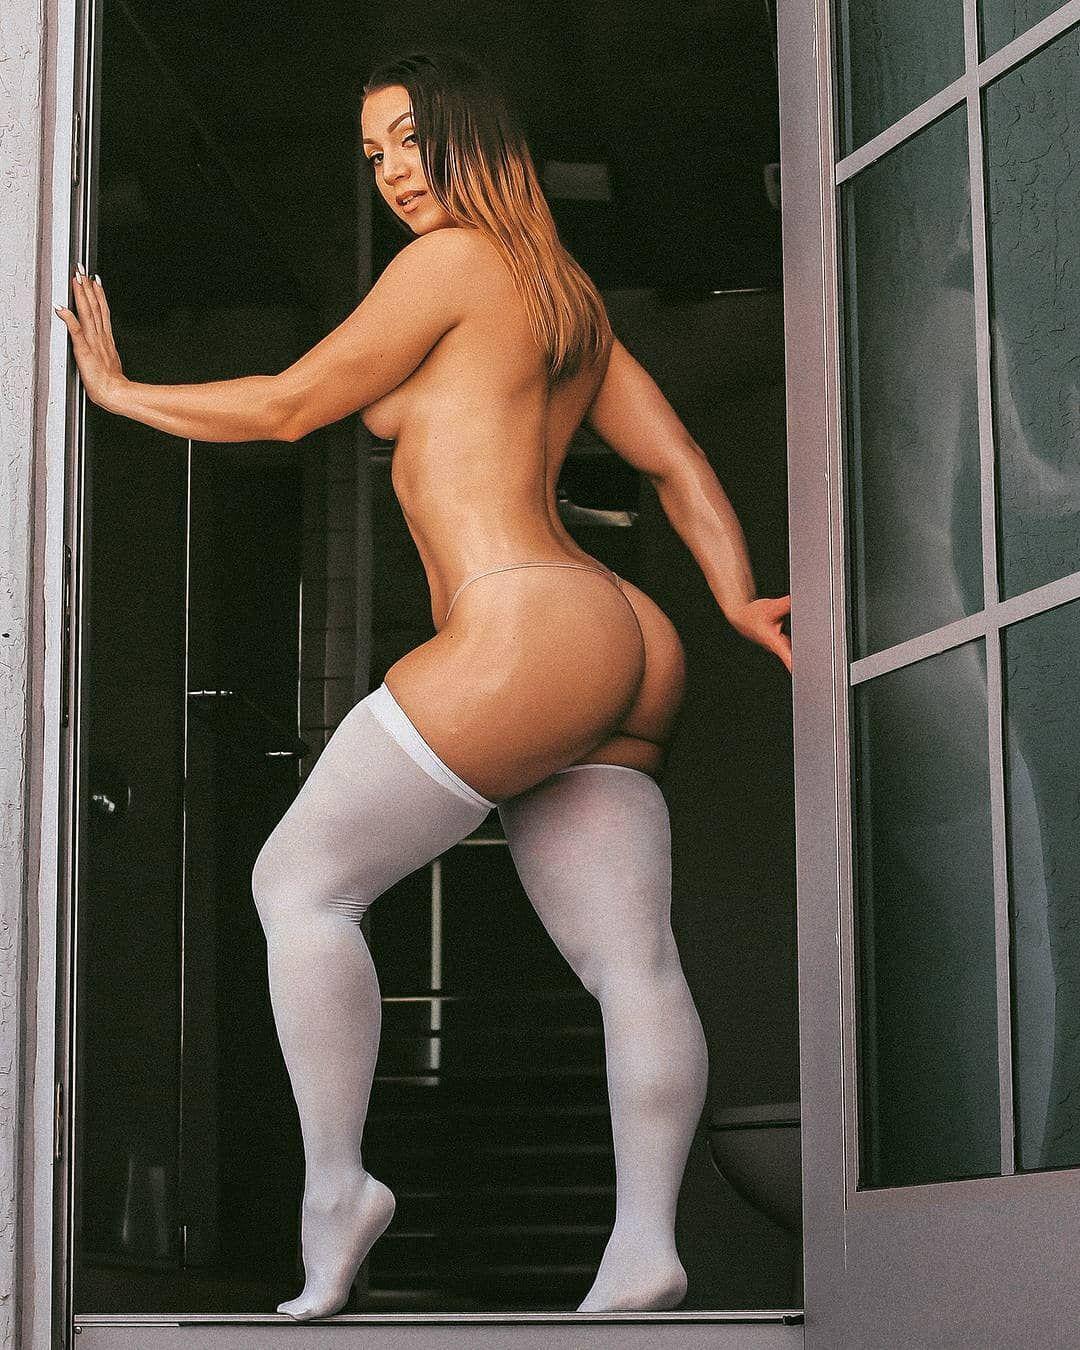 Nackt mary bellavita Search Results